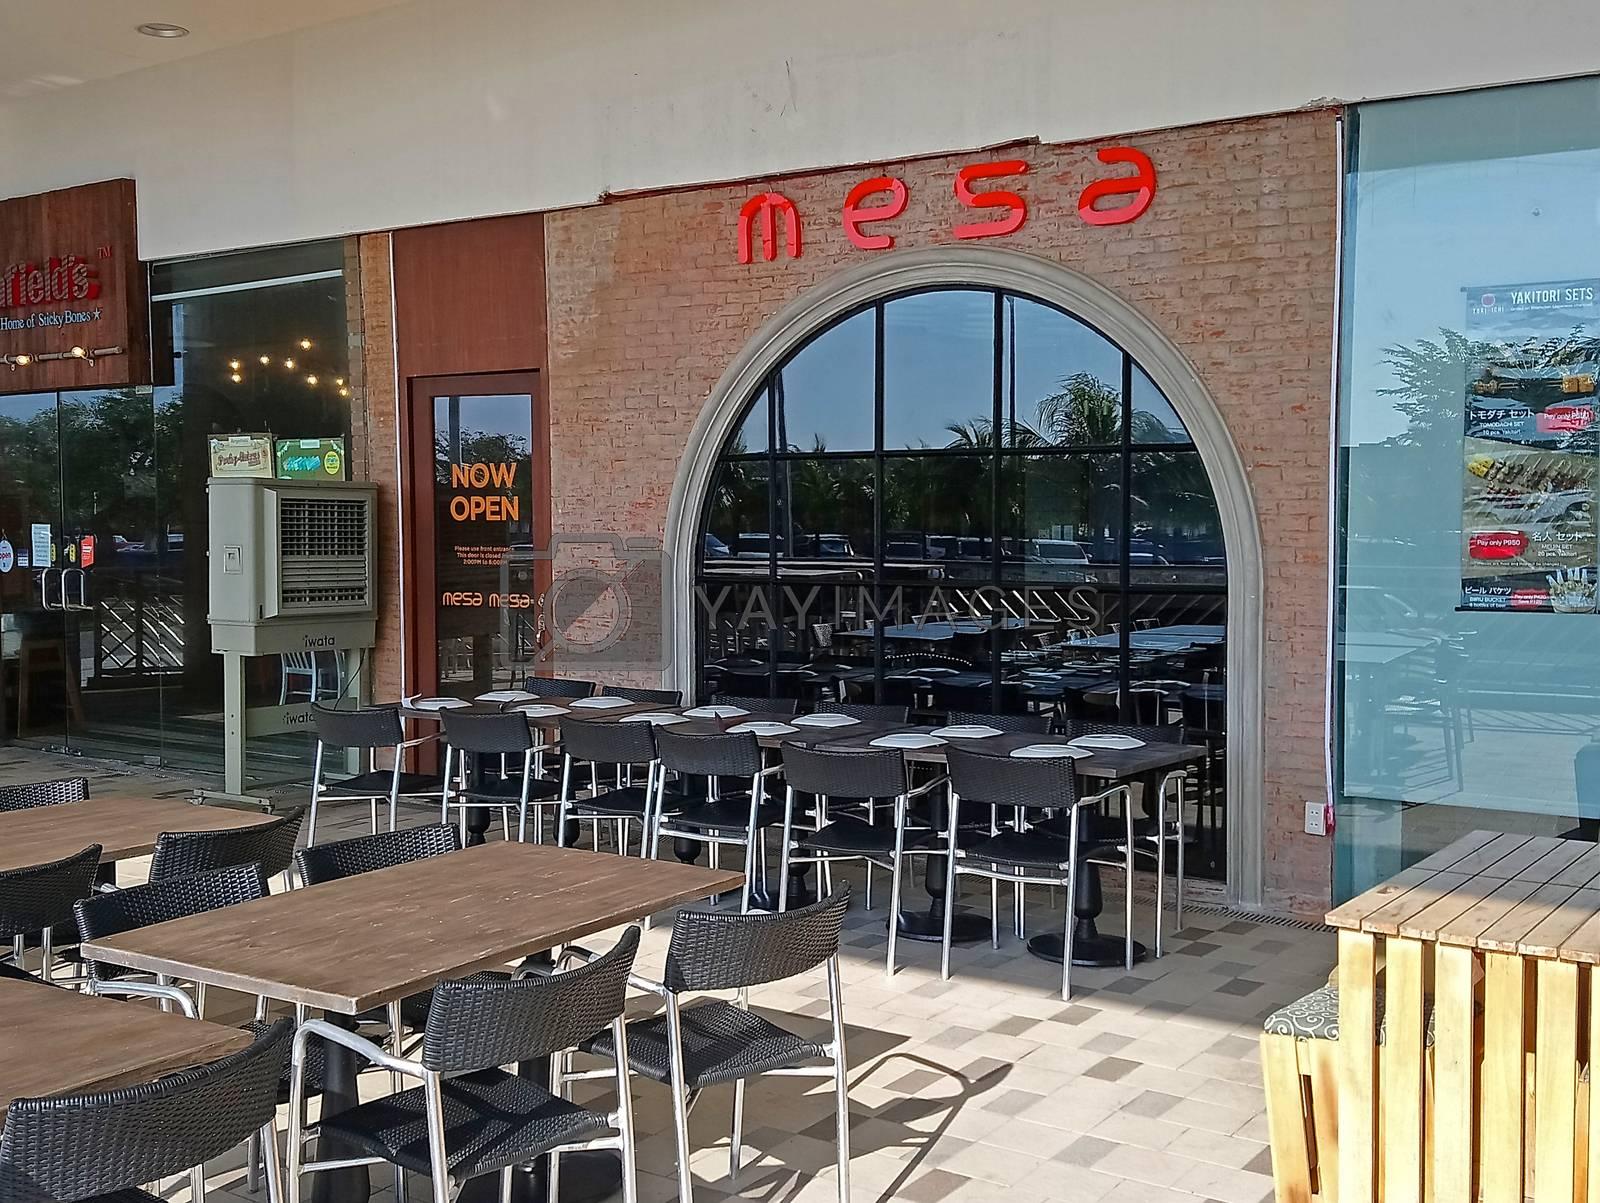 PASAY, PH - NOV 12 - Mesa restaurant facade on November 12, 2018 in Pasay, Philippines.